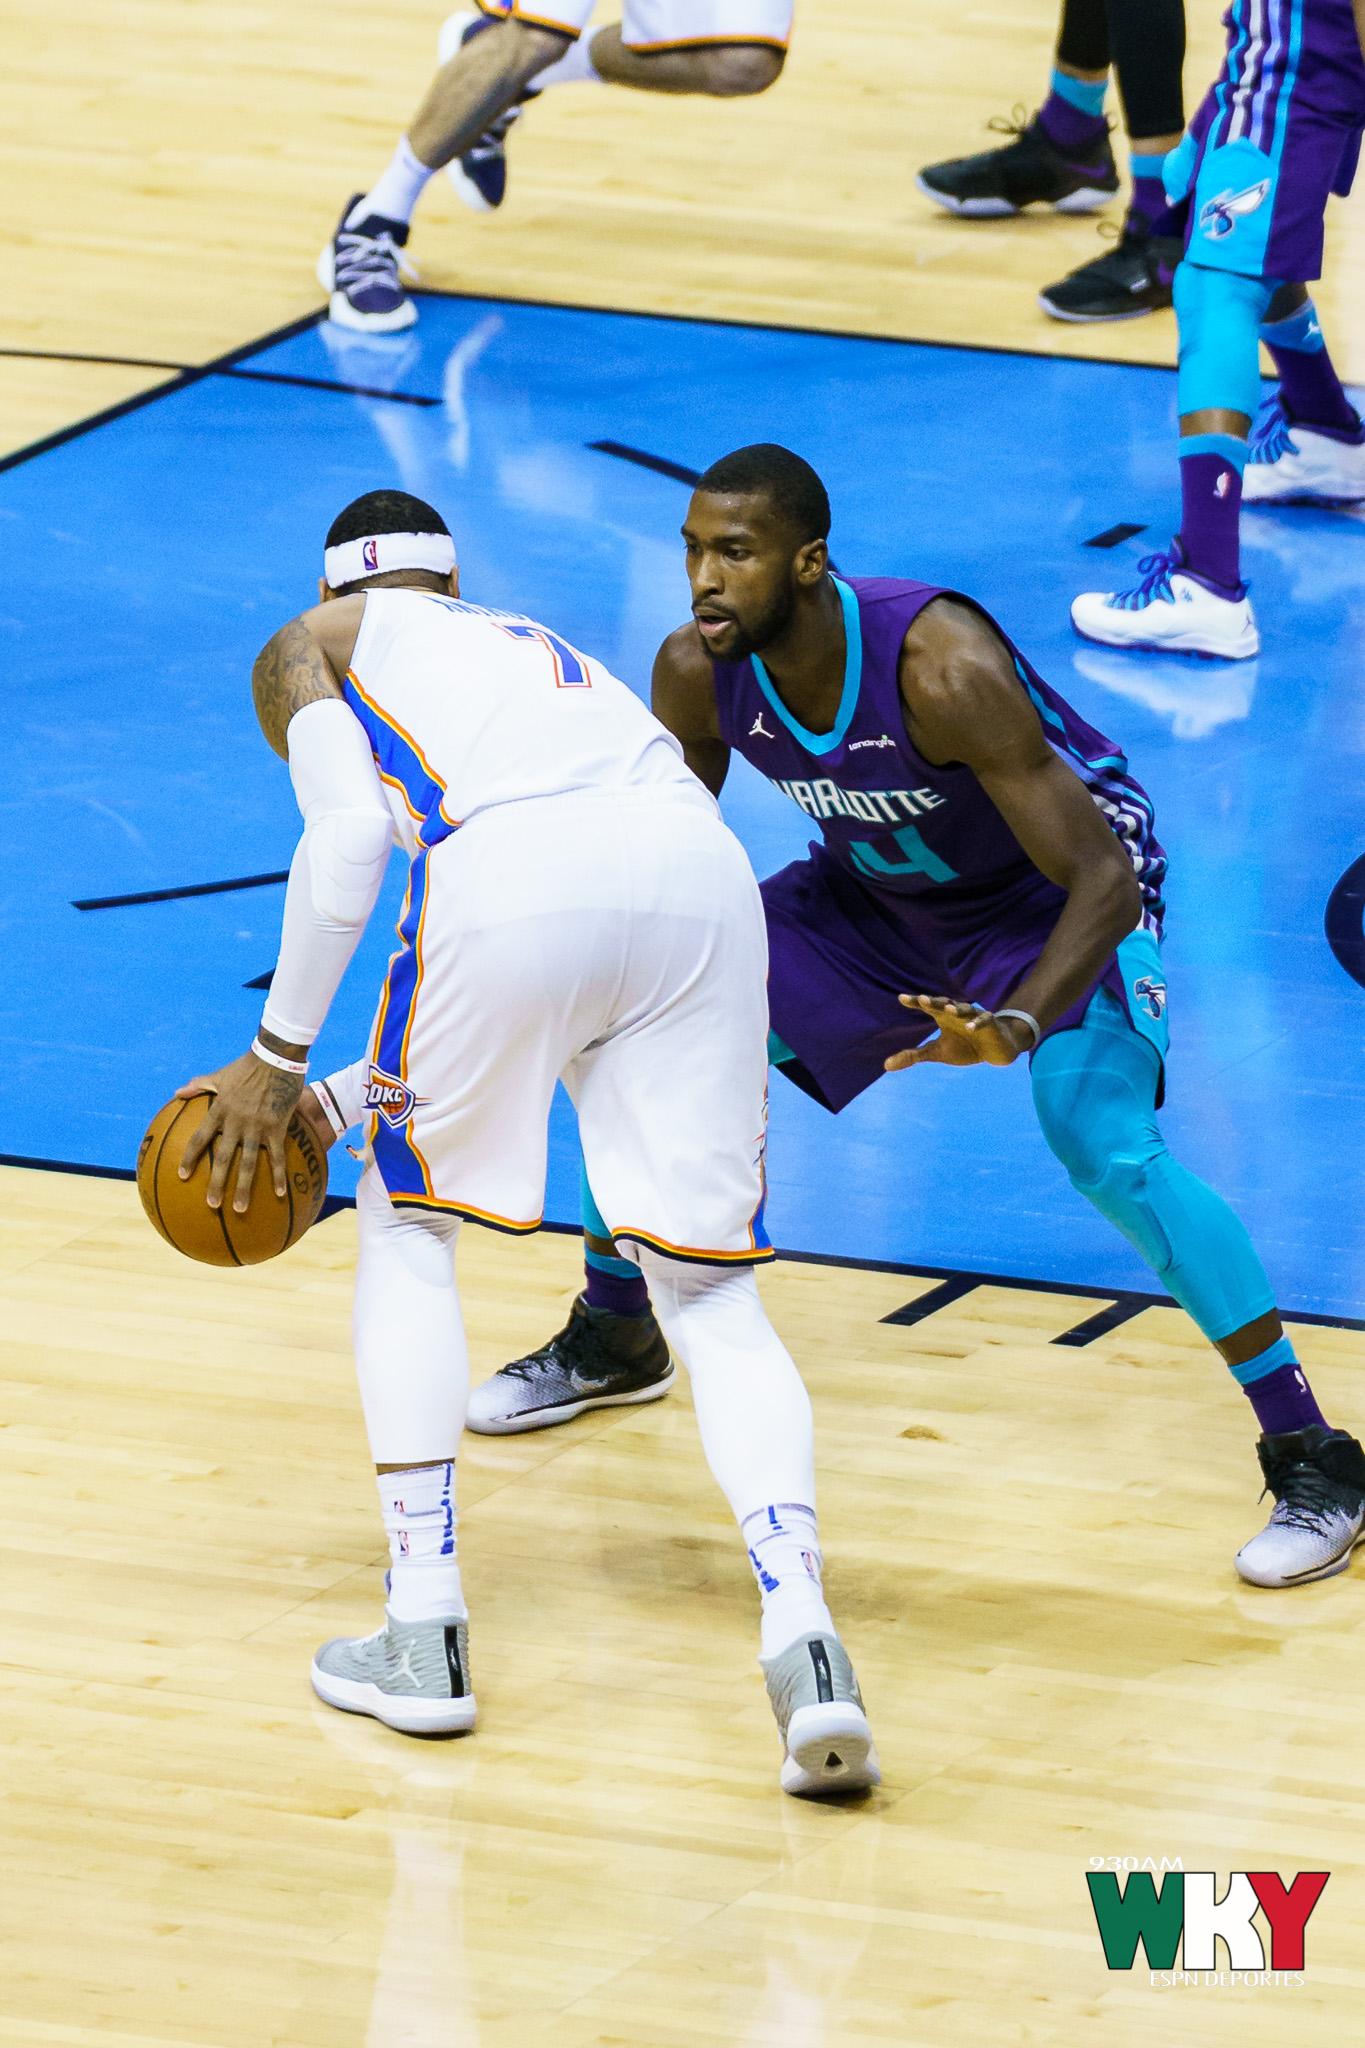 Oklahoma City Thunder vs. Charlotte Hornets